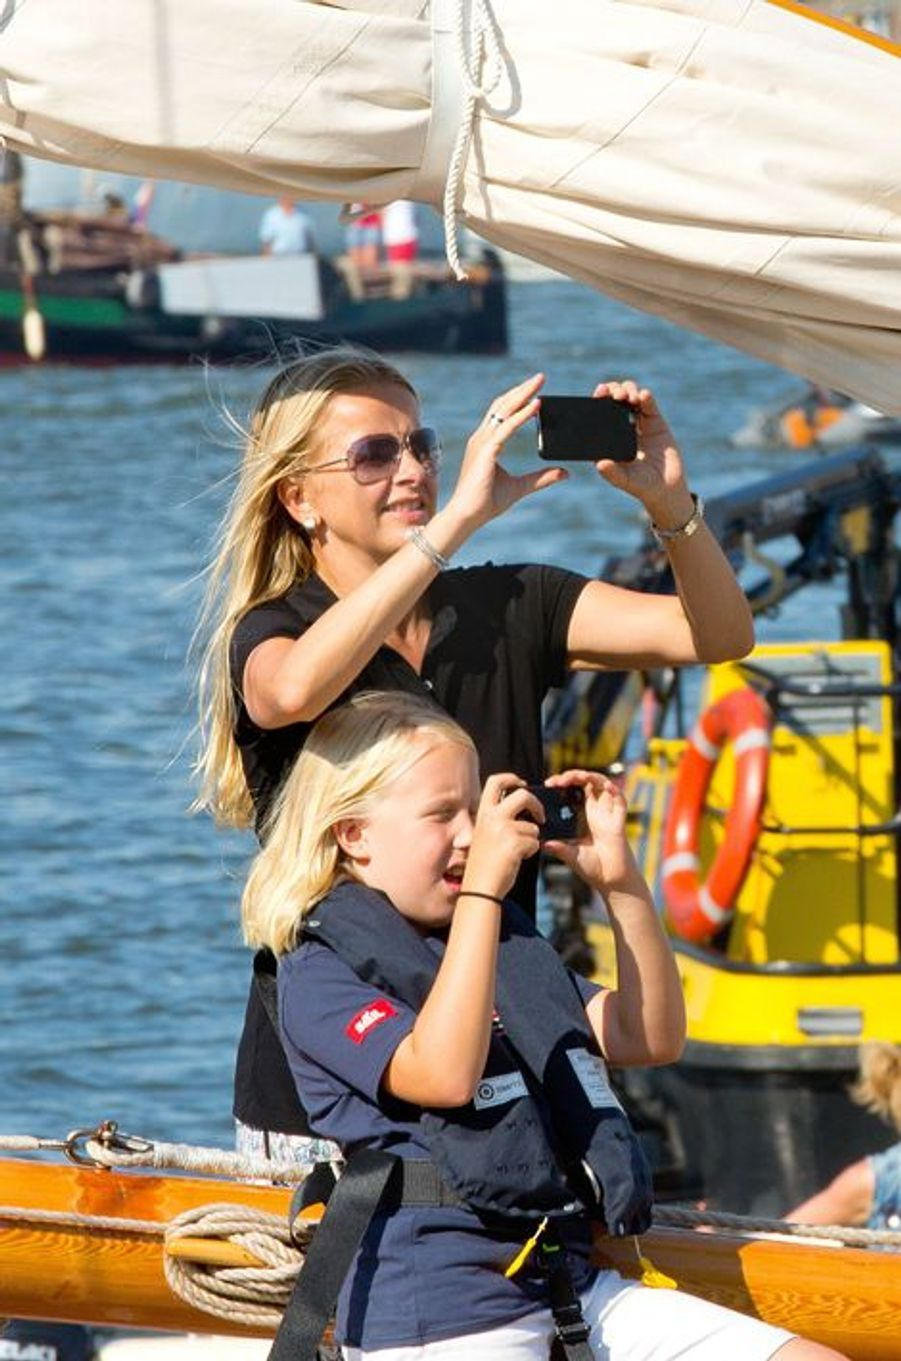 La princesse Mabel et sa fille Luana au Sail Amsterdam, le 22 août 2015